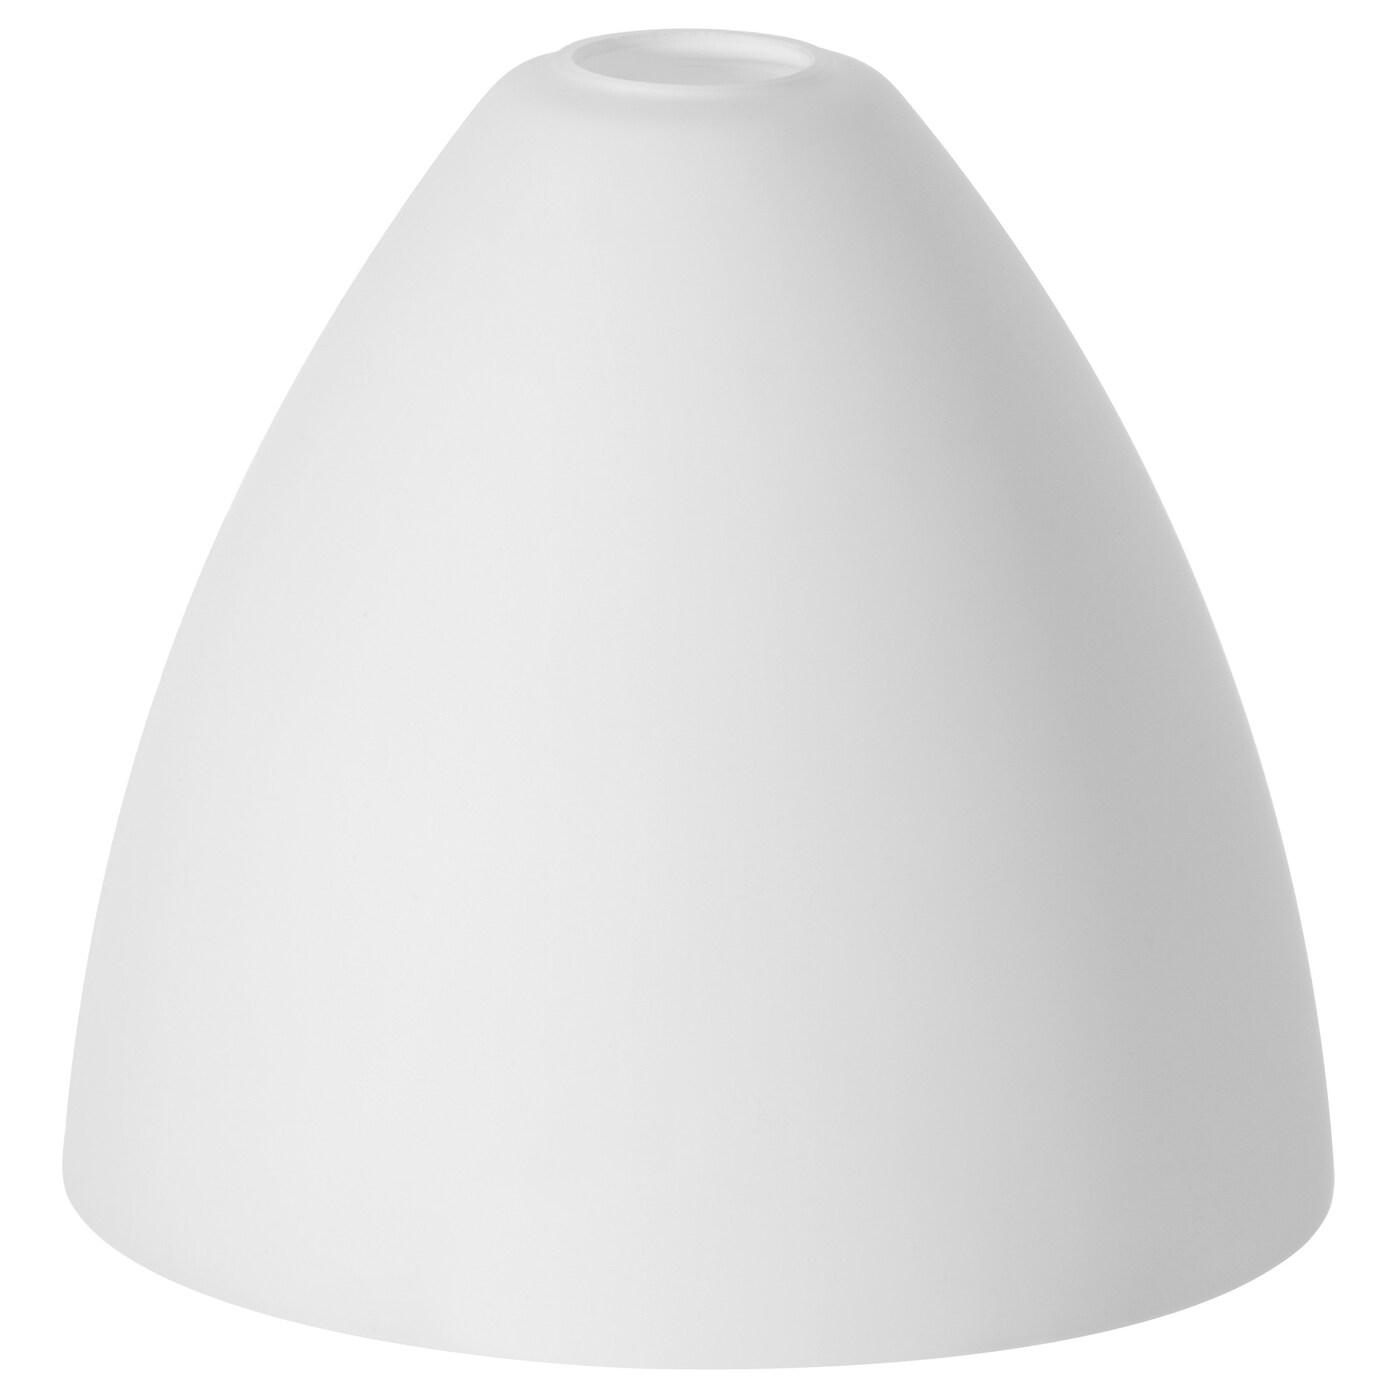 Best Pantalla Lampara De Pie Ikea Image Collection